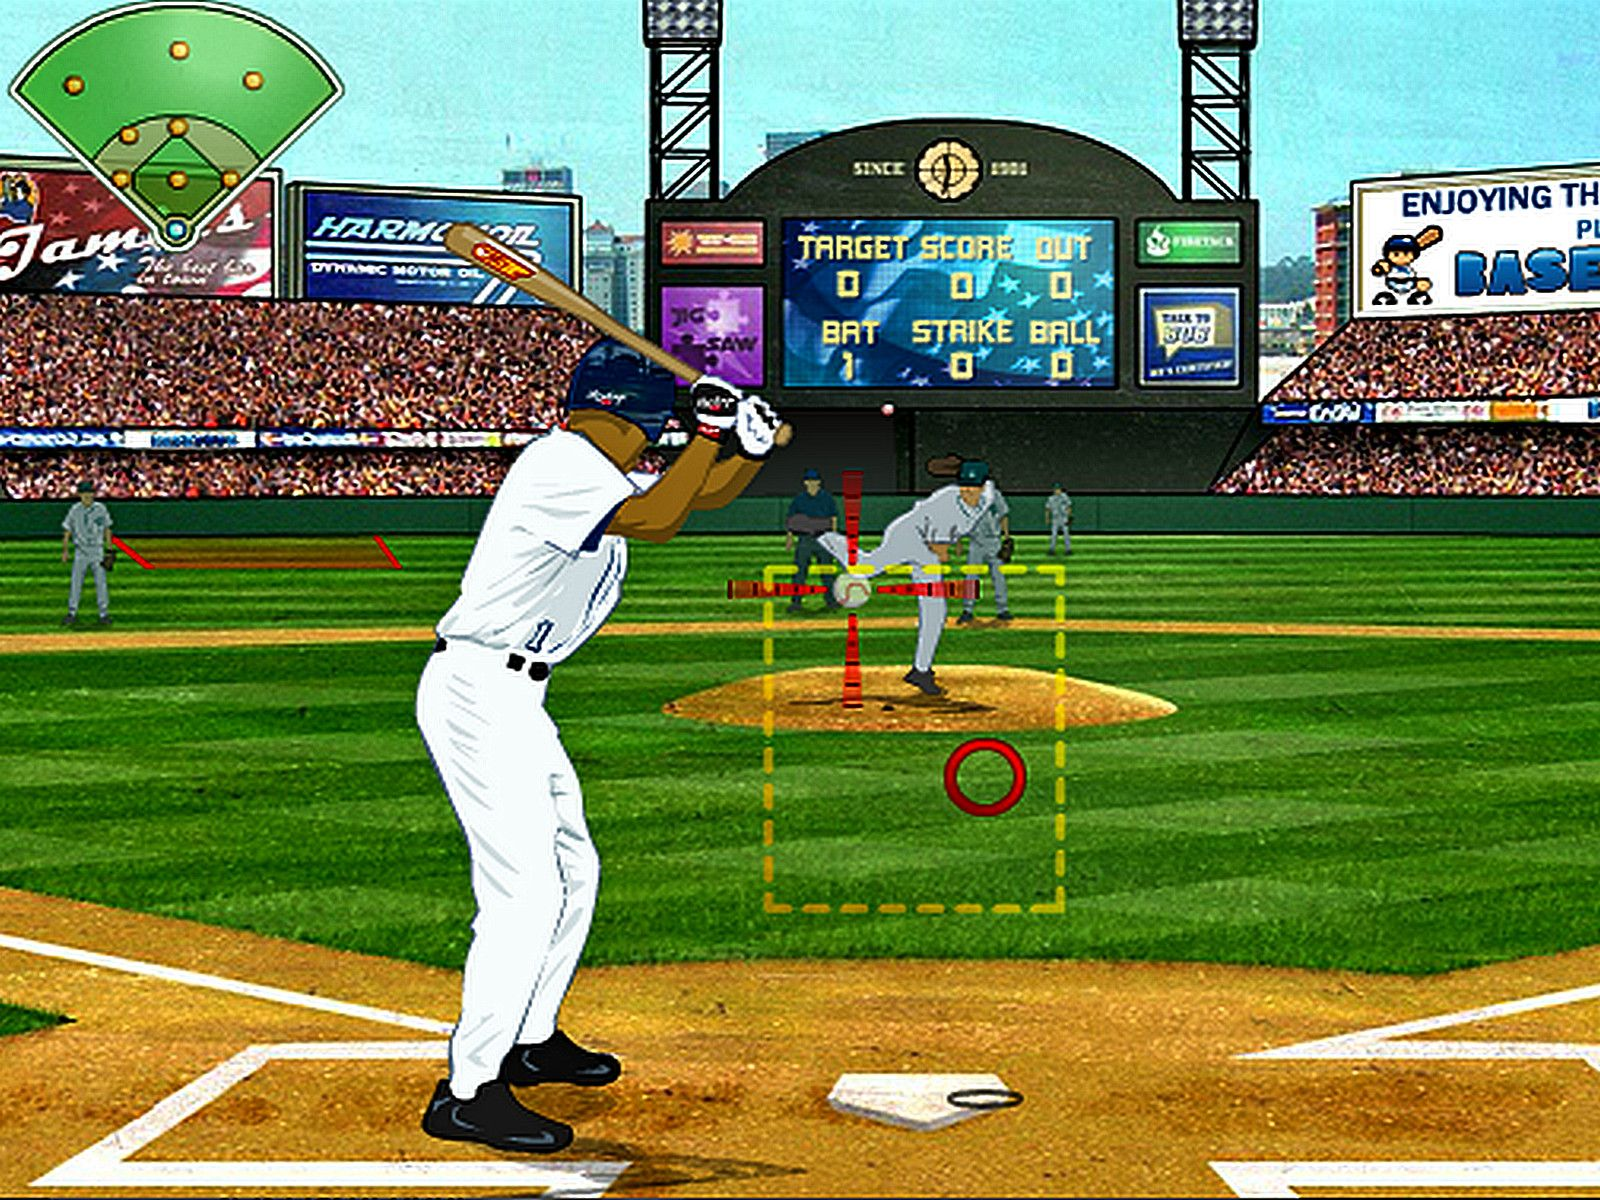 State of Play Baseball Play baseball, State of play